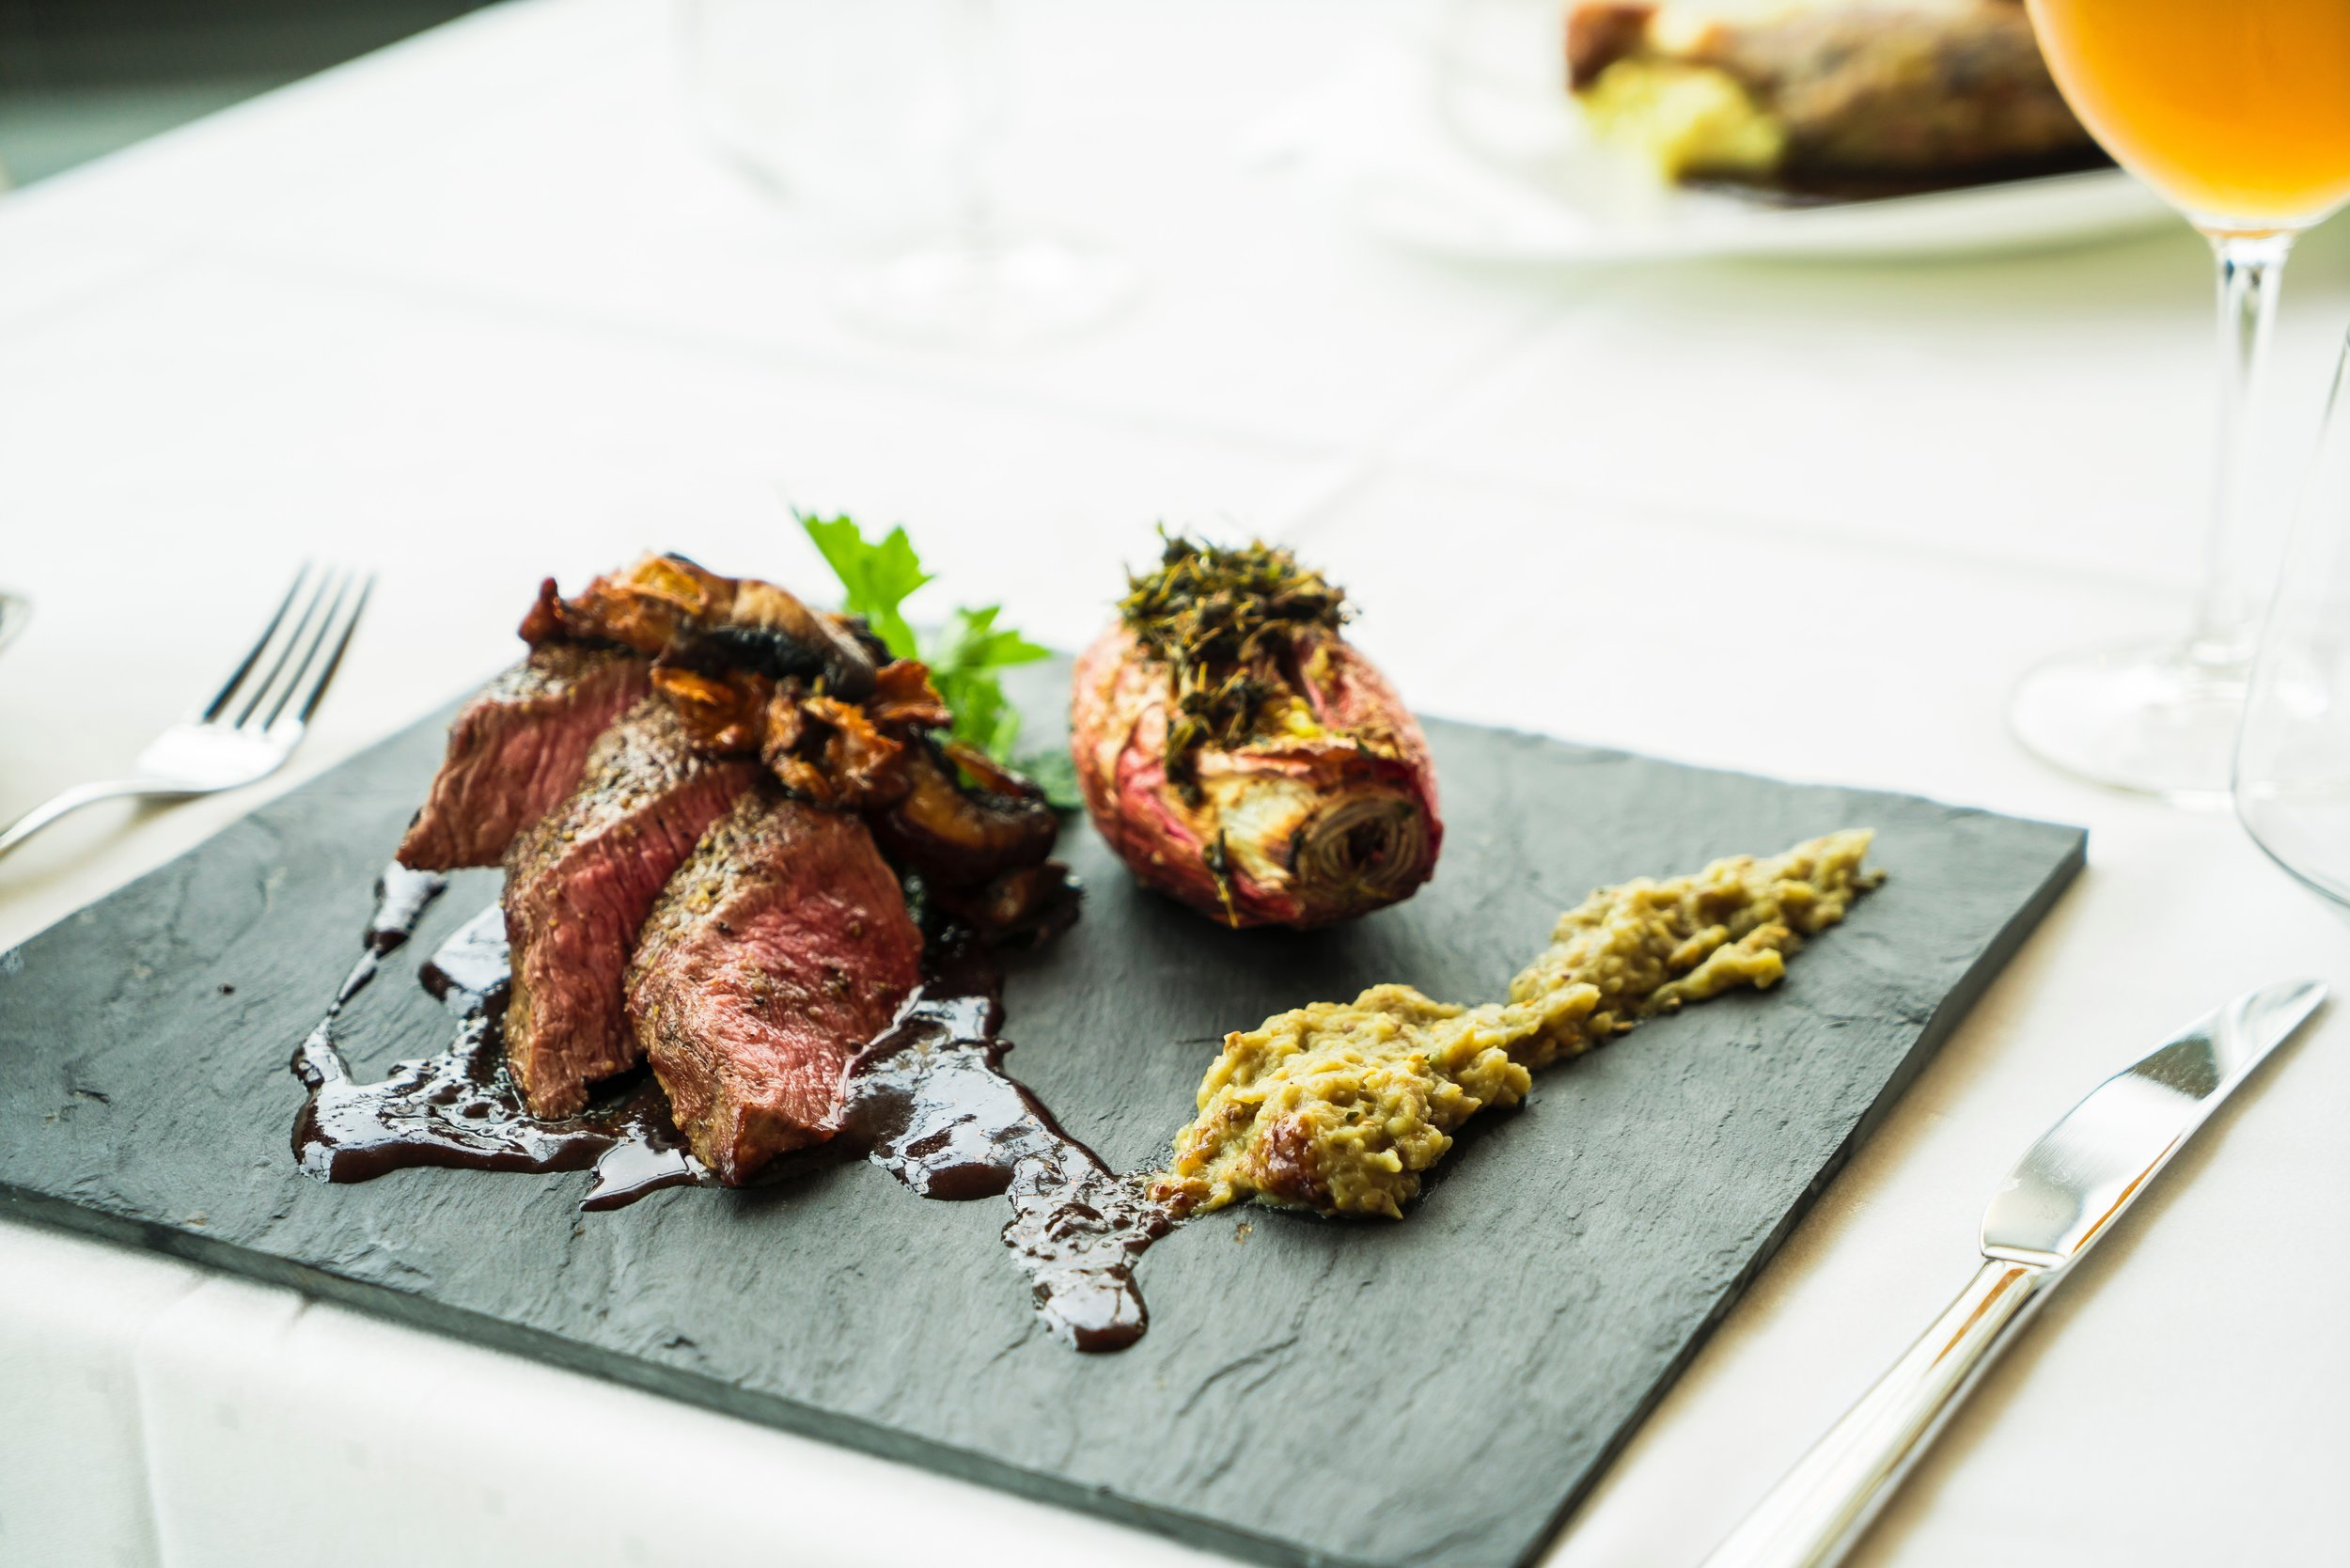 cuisine-cutlery-dinner-299351.jpg